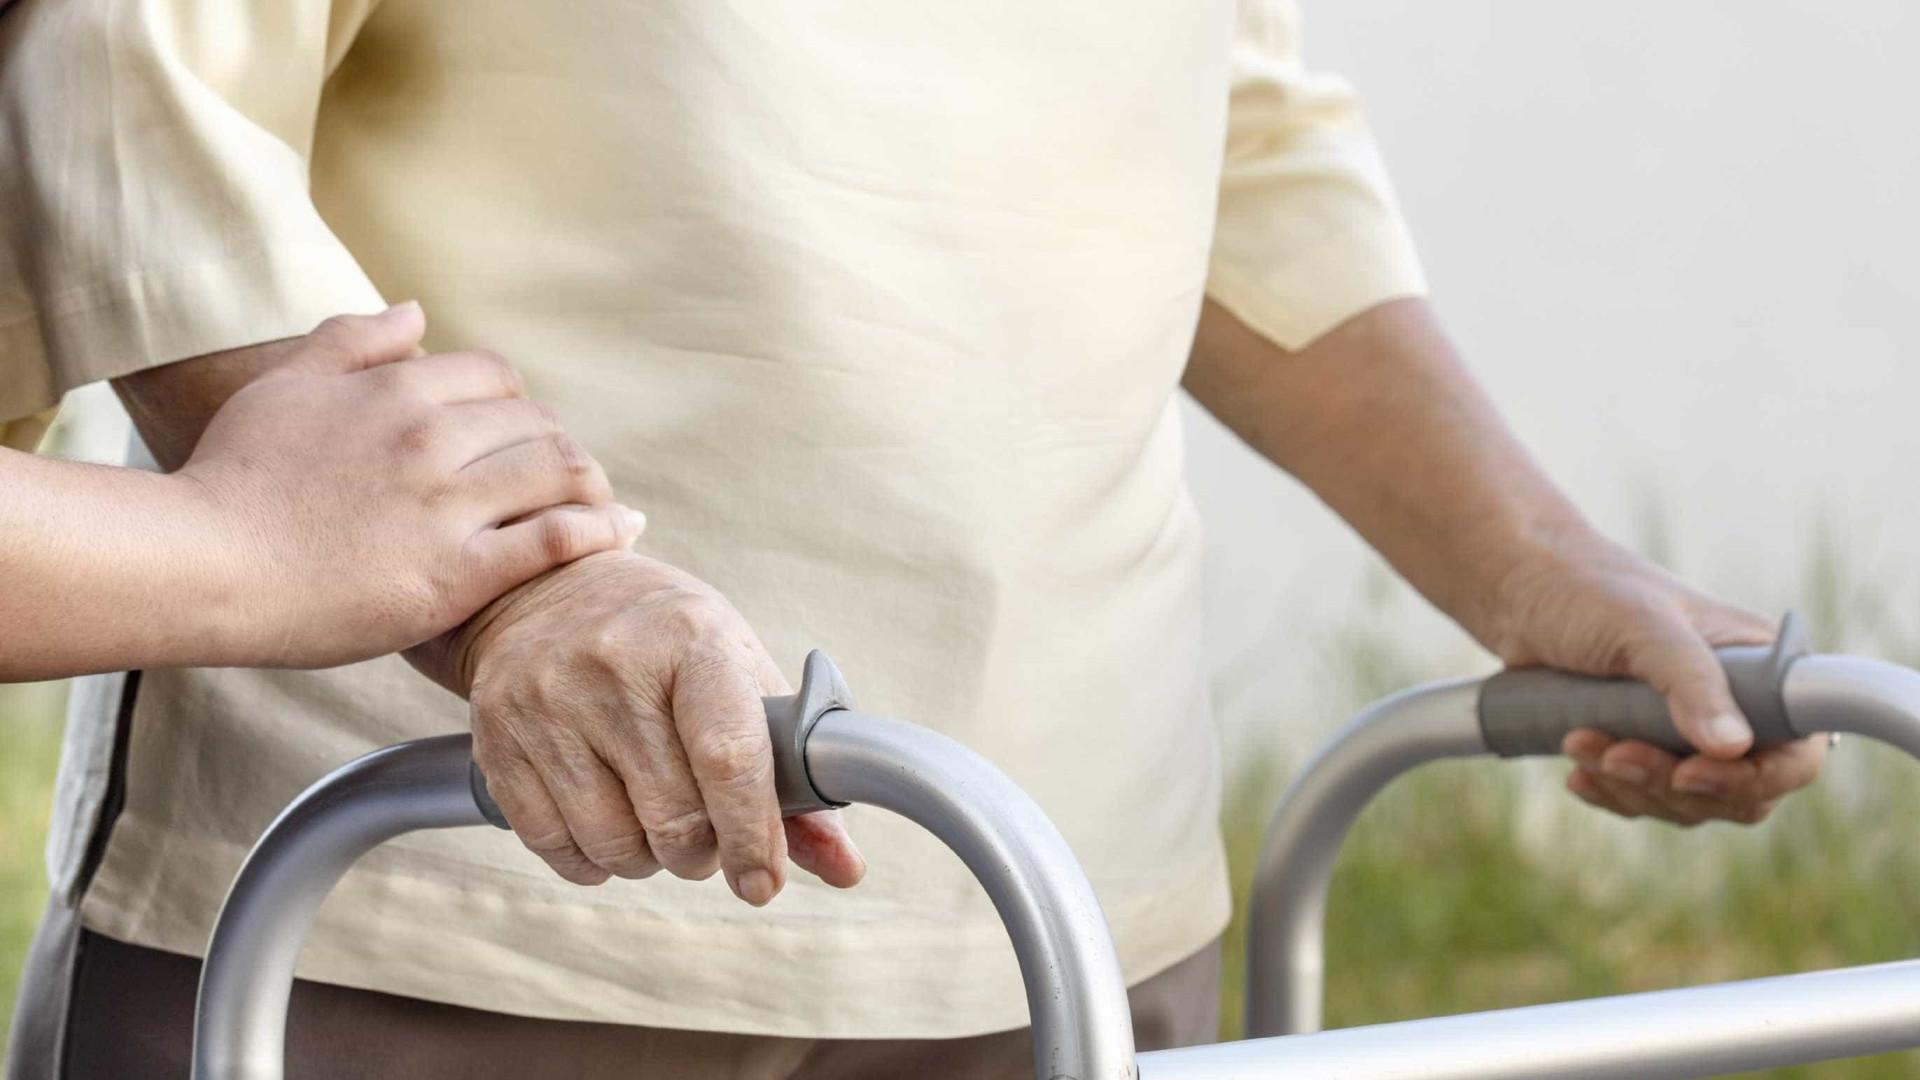 Constituídos cinco arguidos por maus-tratos a idosos